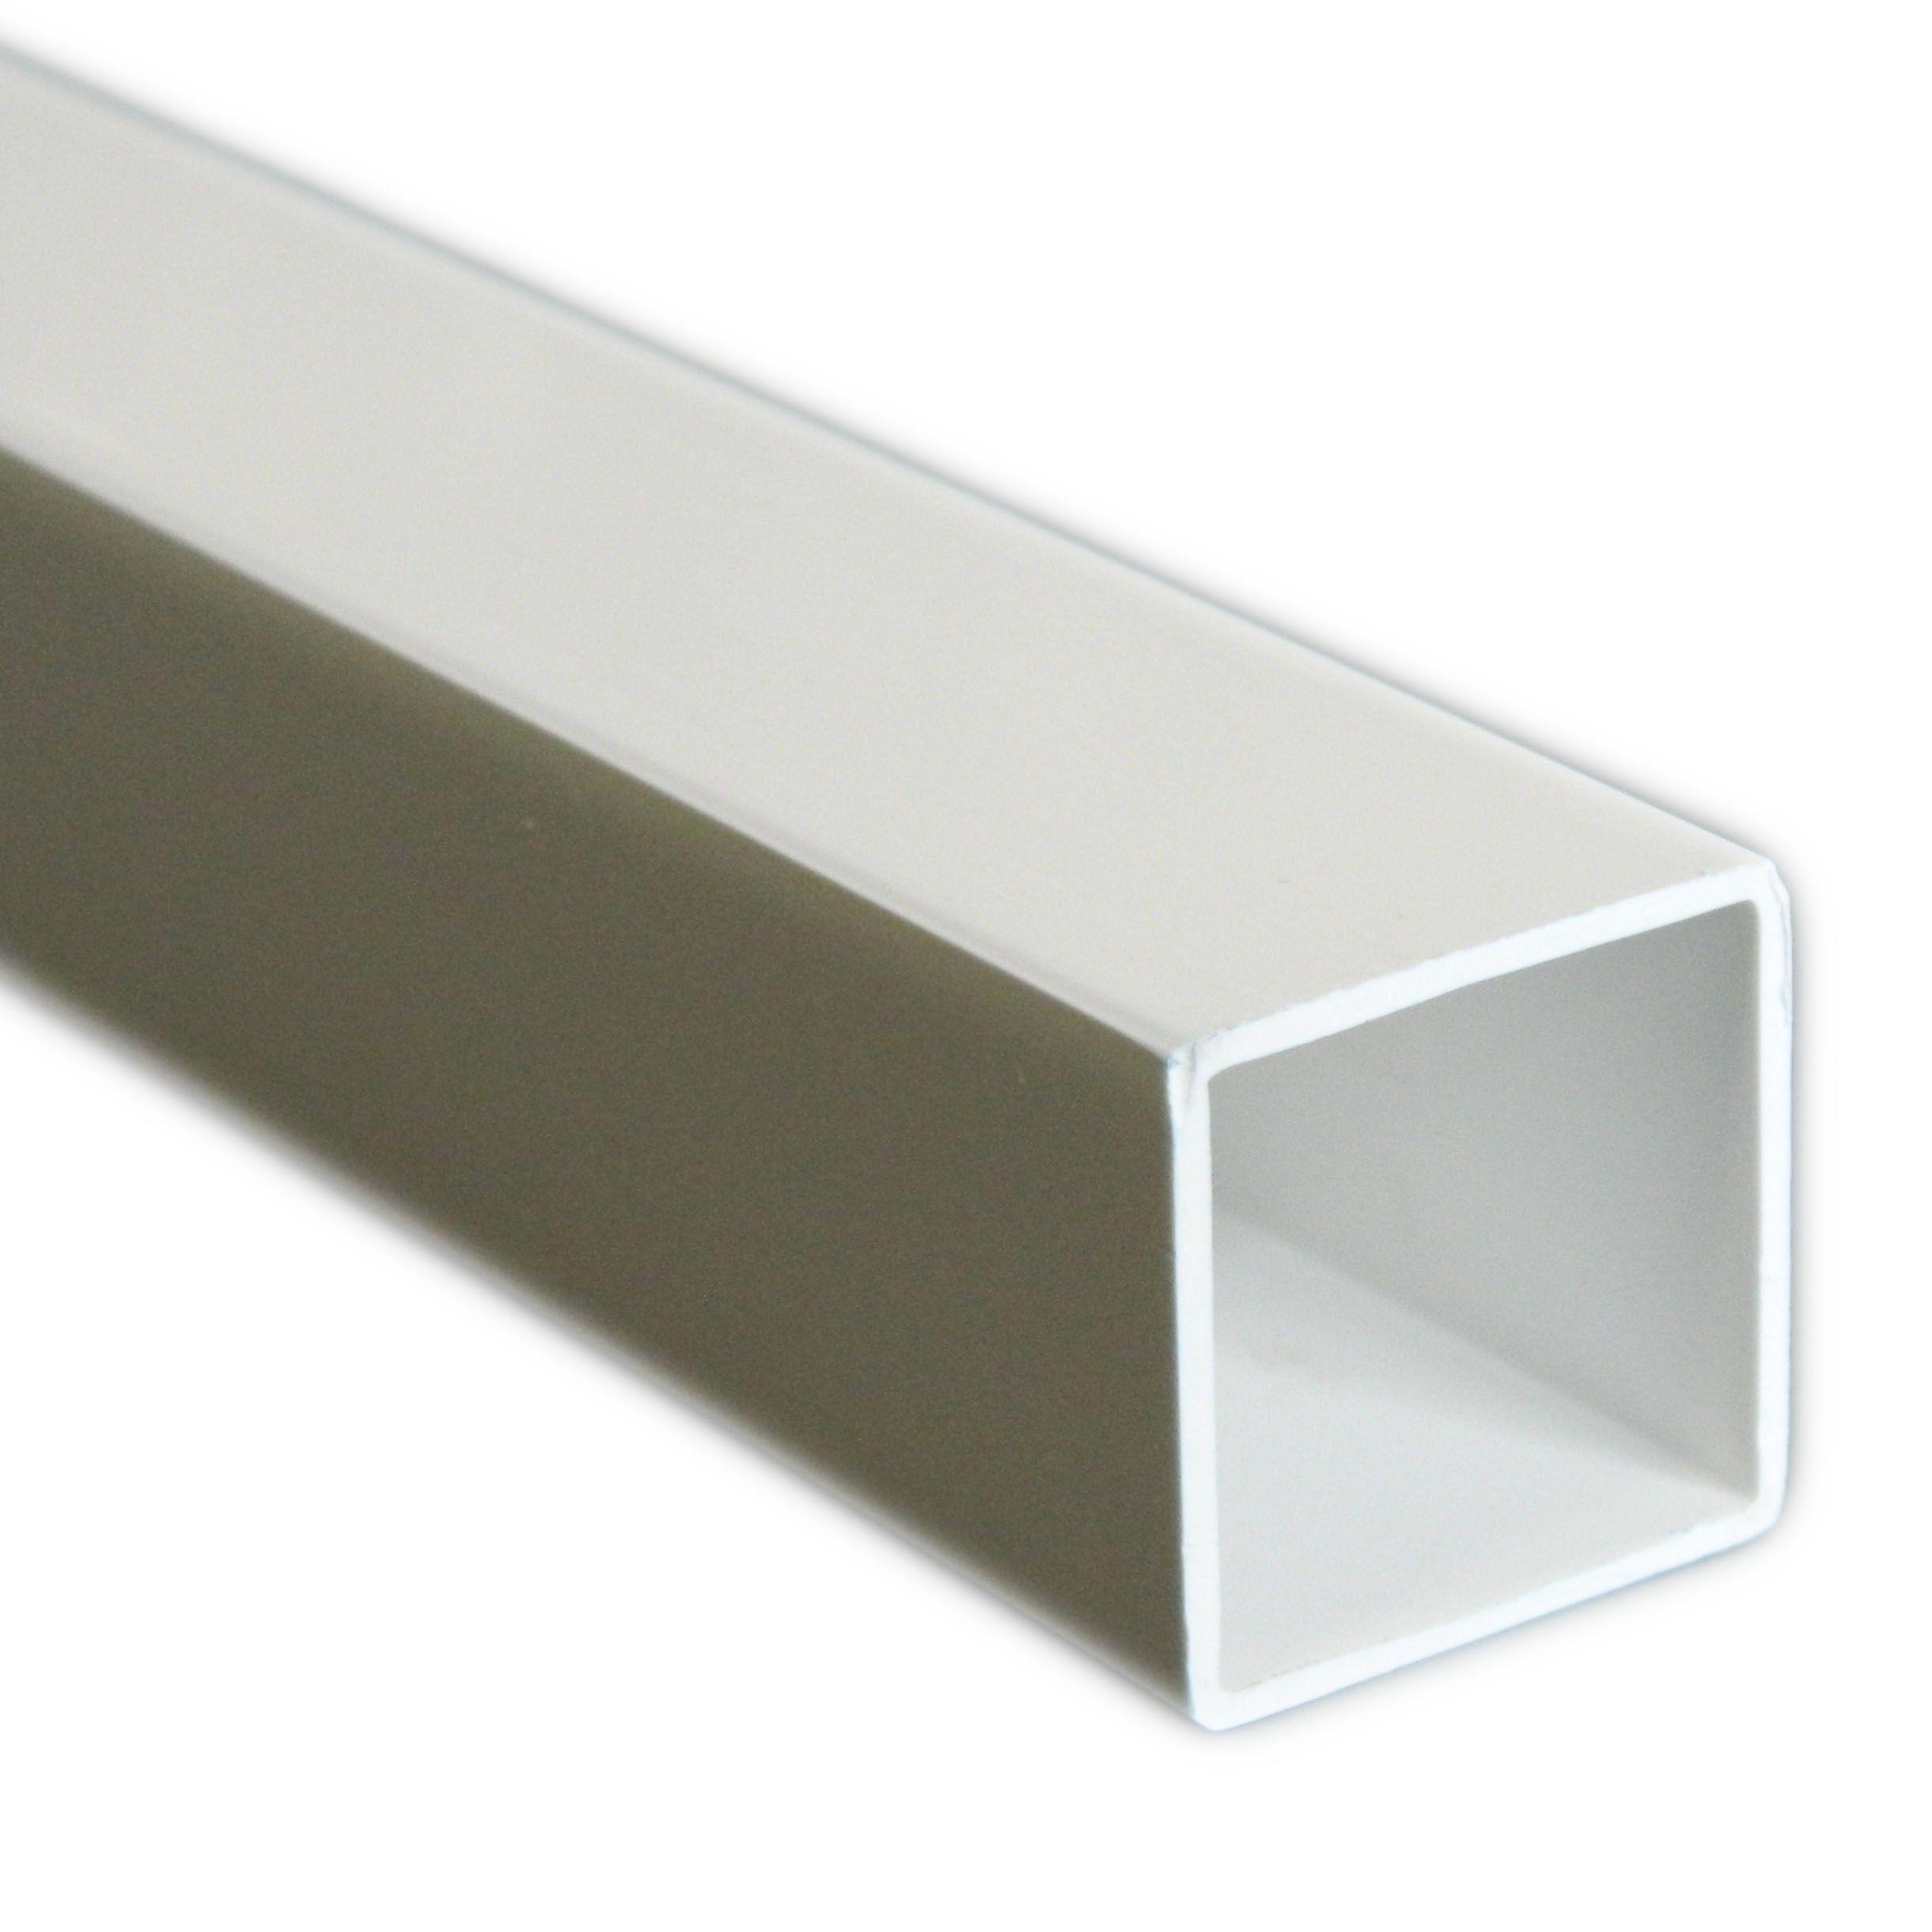 White Plastic Square Tube W 15mm L 1 M Departments